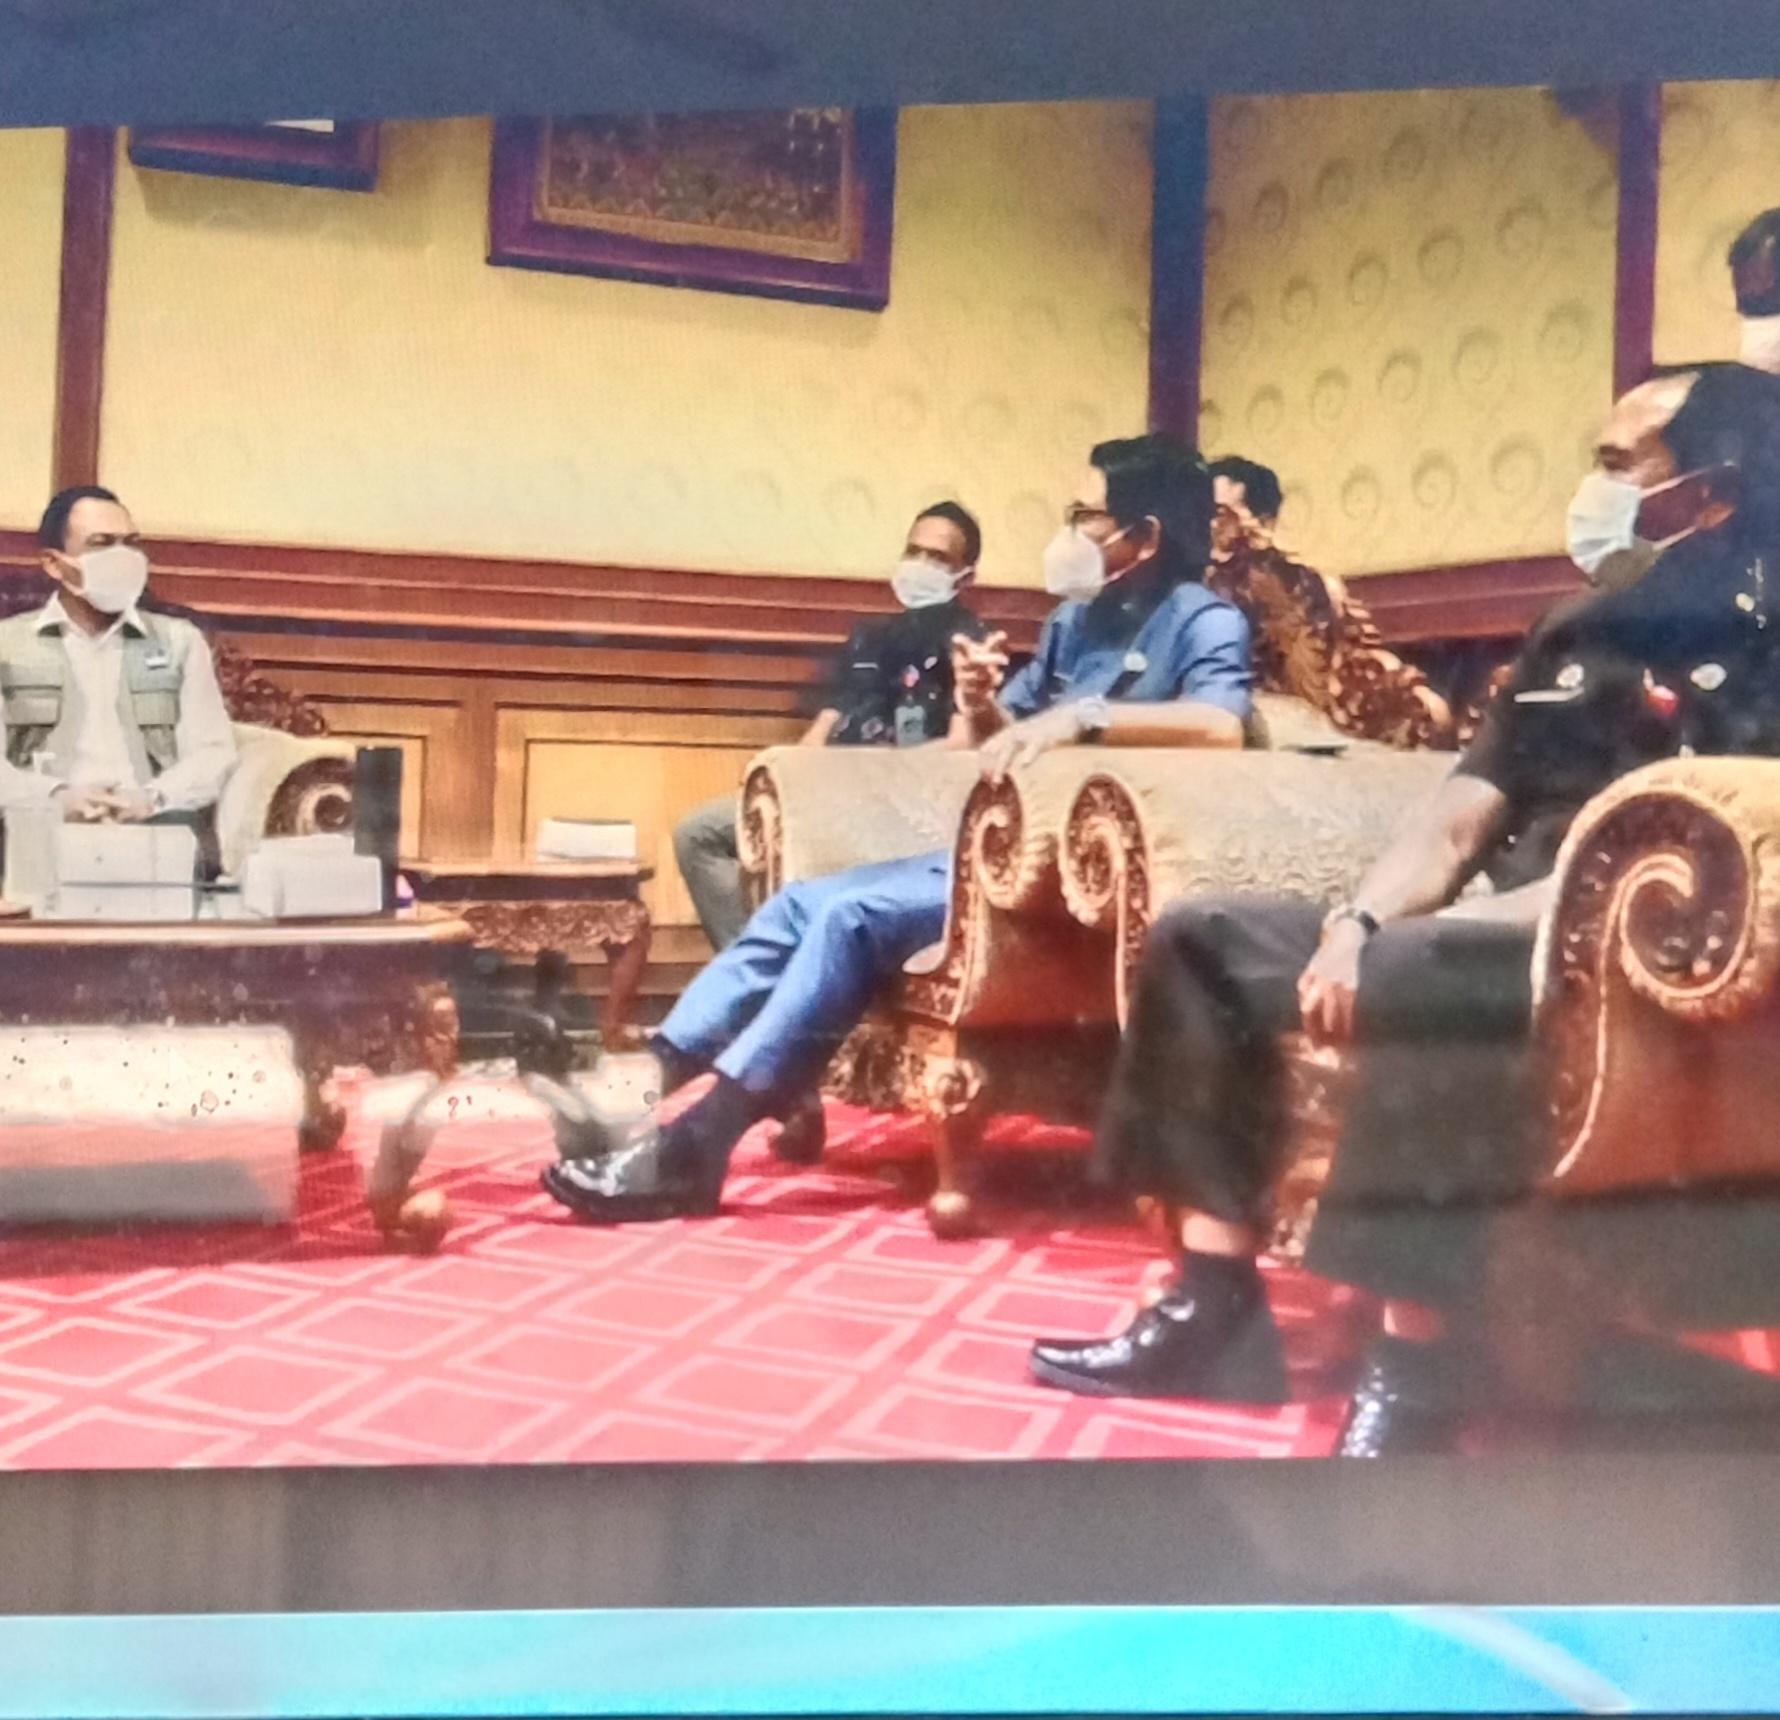 SEKDA Badung, Wayan Adi Arnawa, menerima Tim Pakar Satgas Covid-19 Pusat yang dipimpin Nyoman Gde Agus Asrama di Puspem Badung, Selasa (10/8/2021). Foto: ist